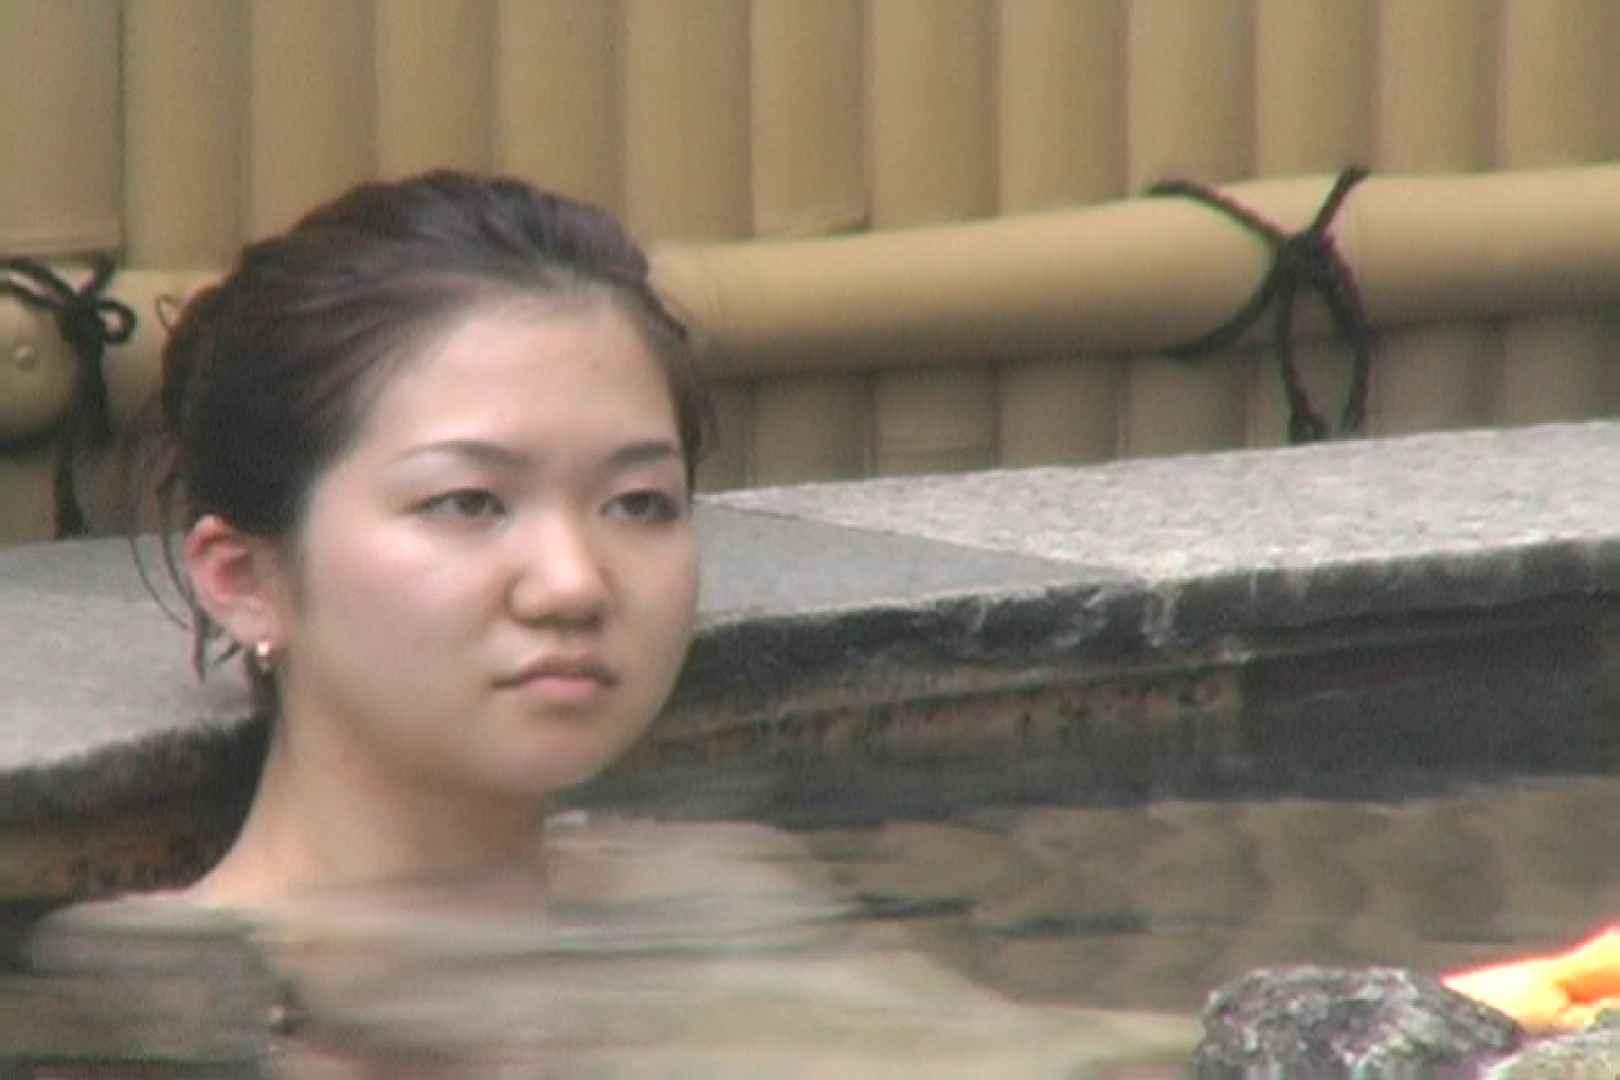 Aquaな露天風呂Vol.641 HなOL | 露天  50pic 23